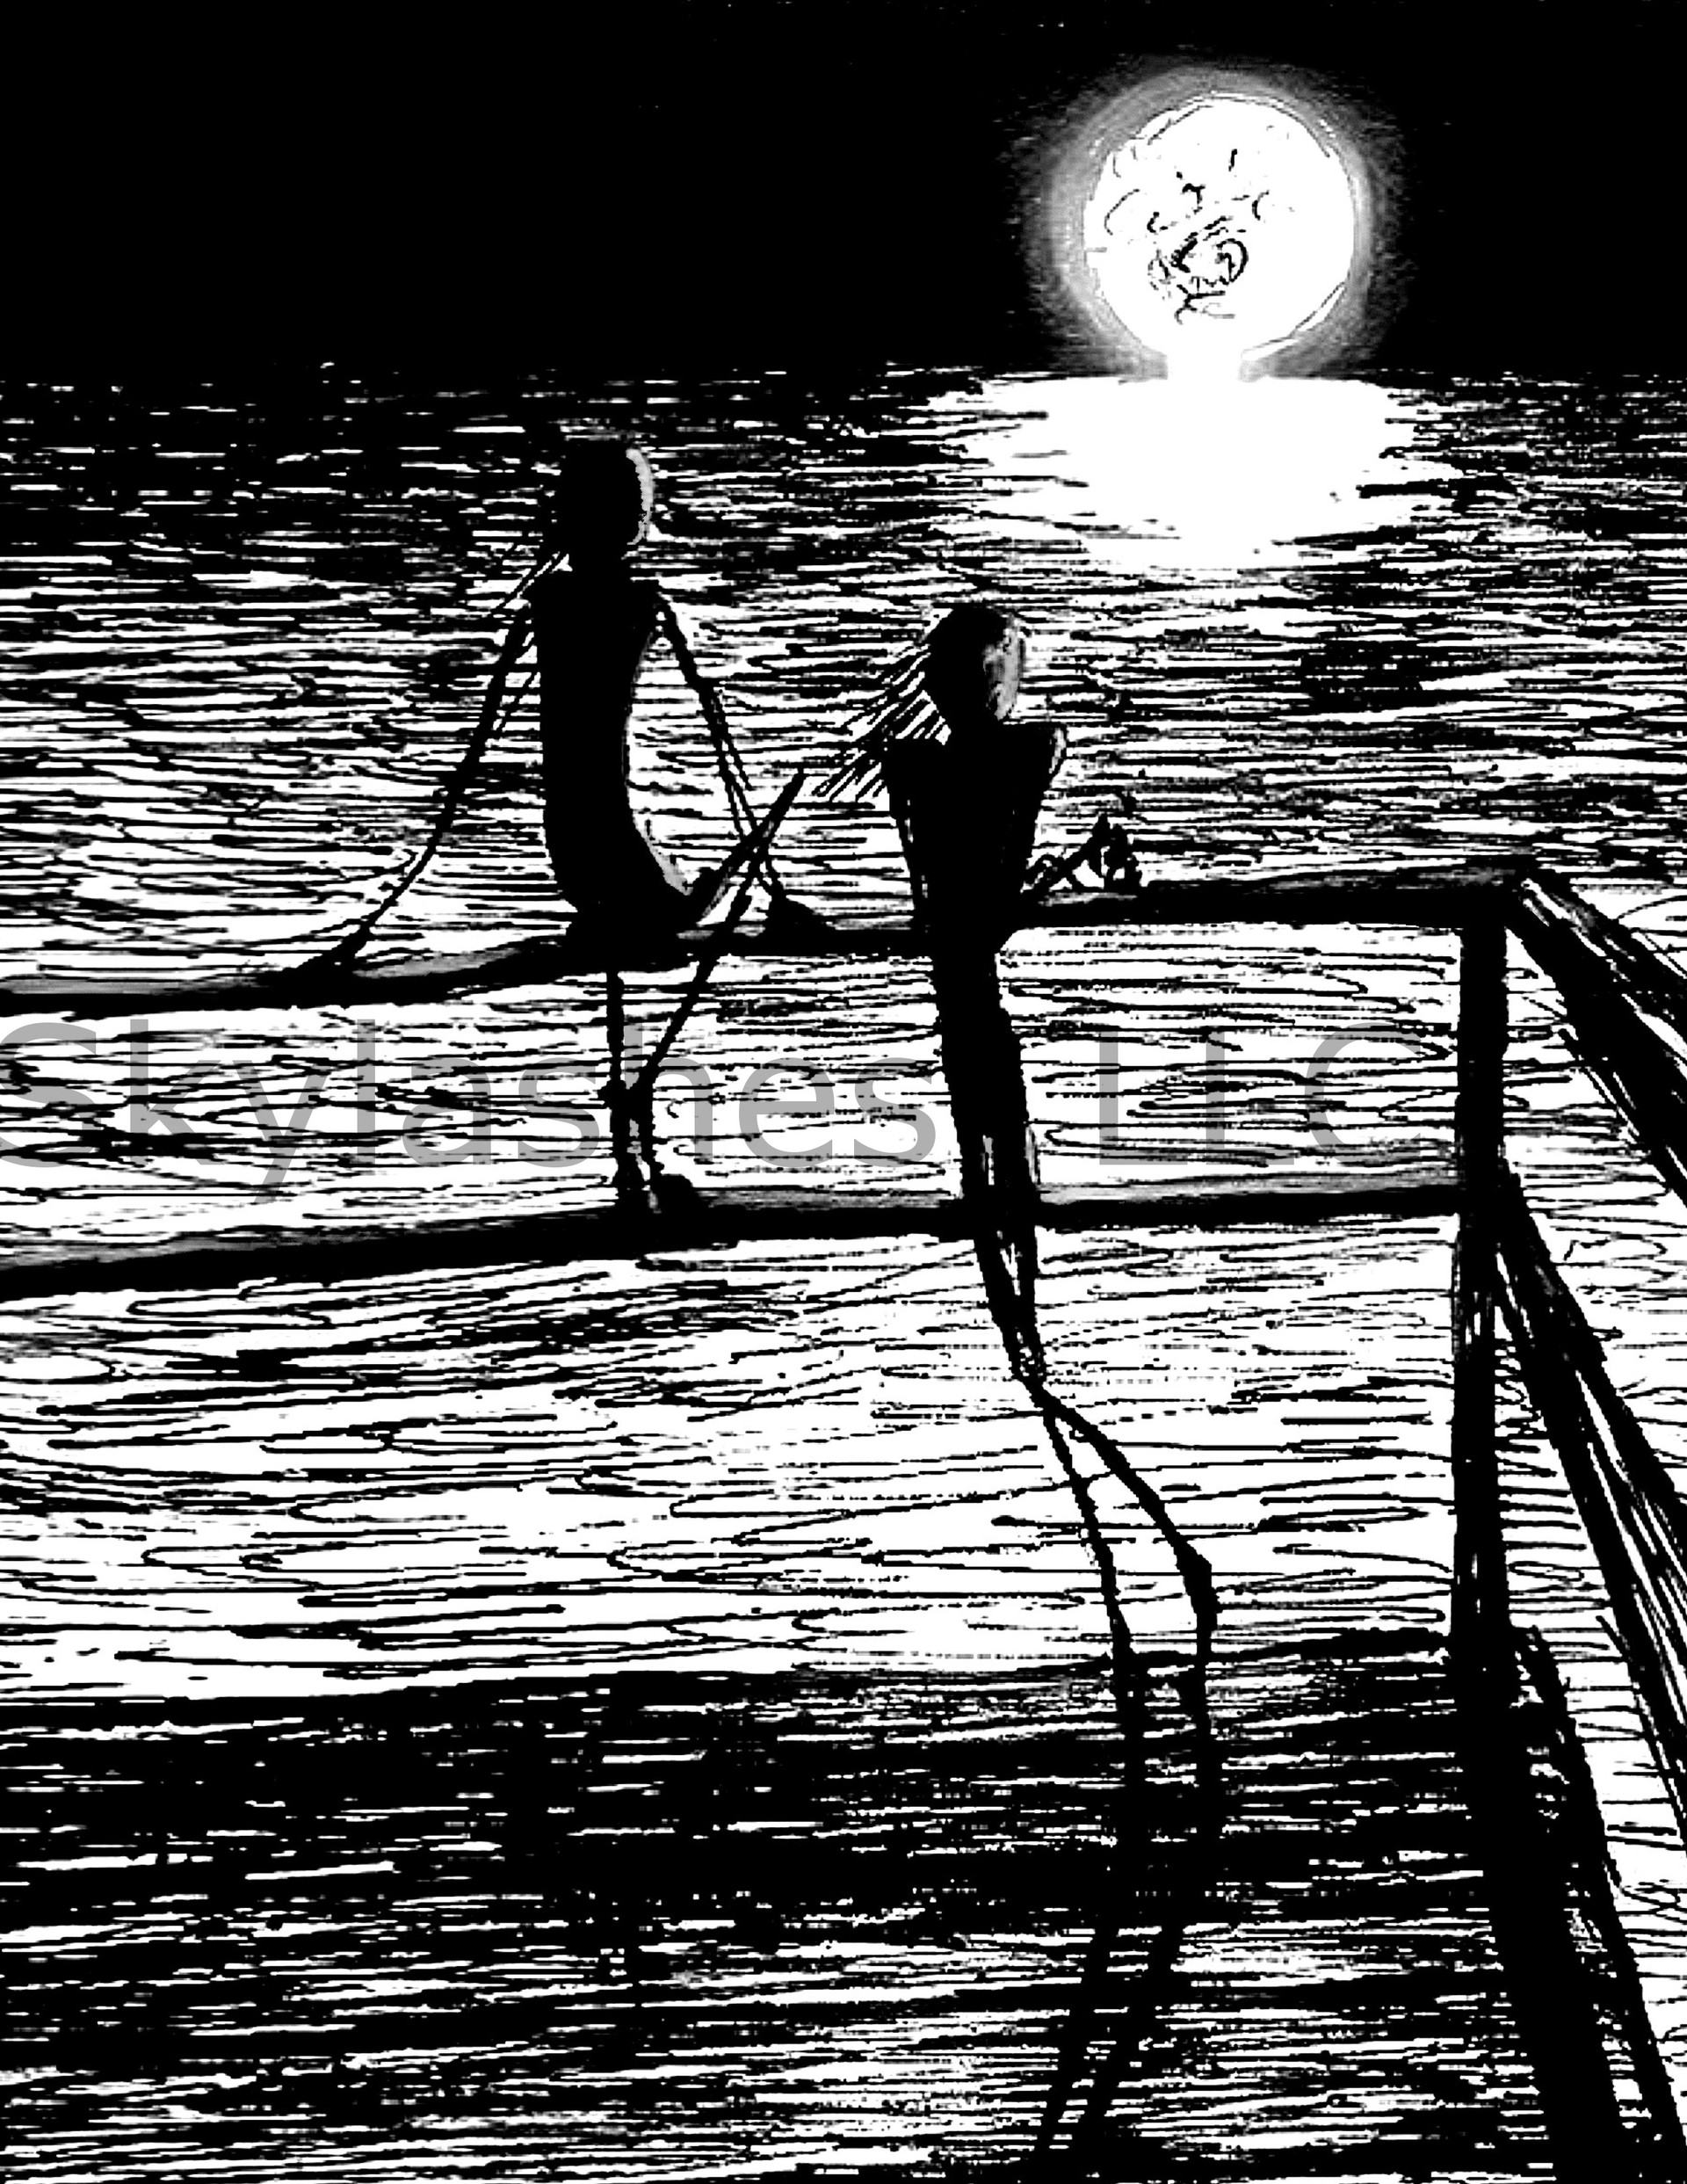 Skylar mcclellan pier watermarked